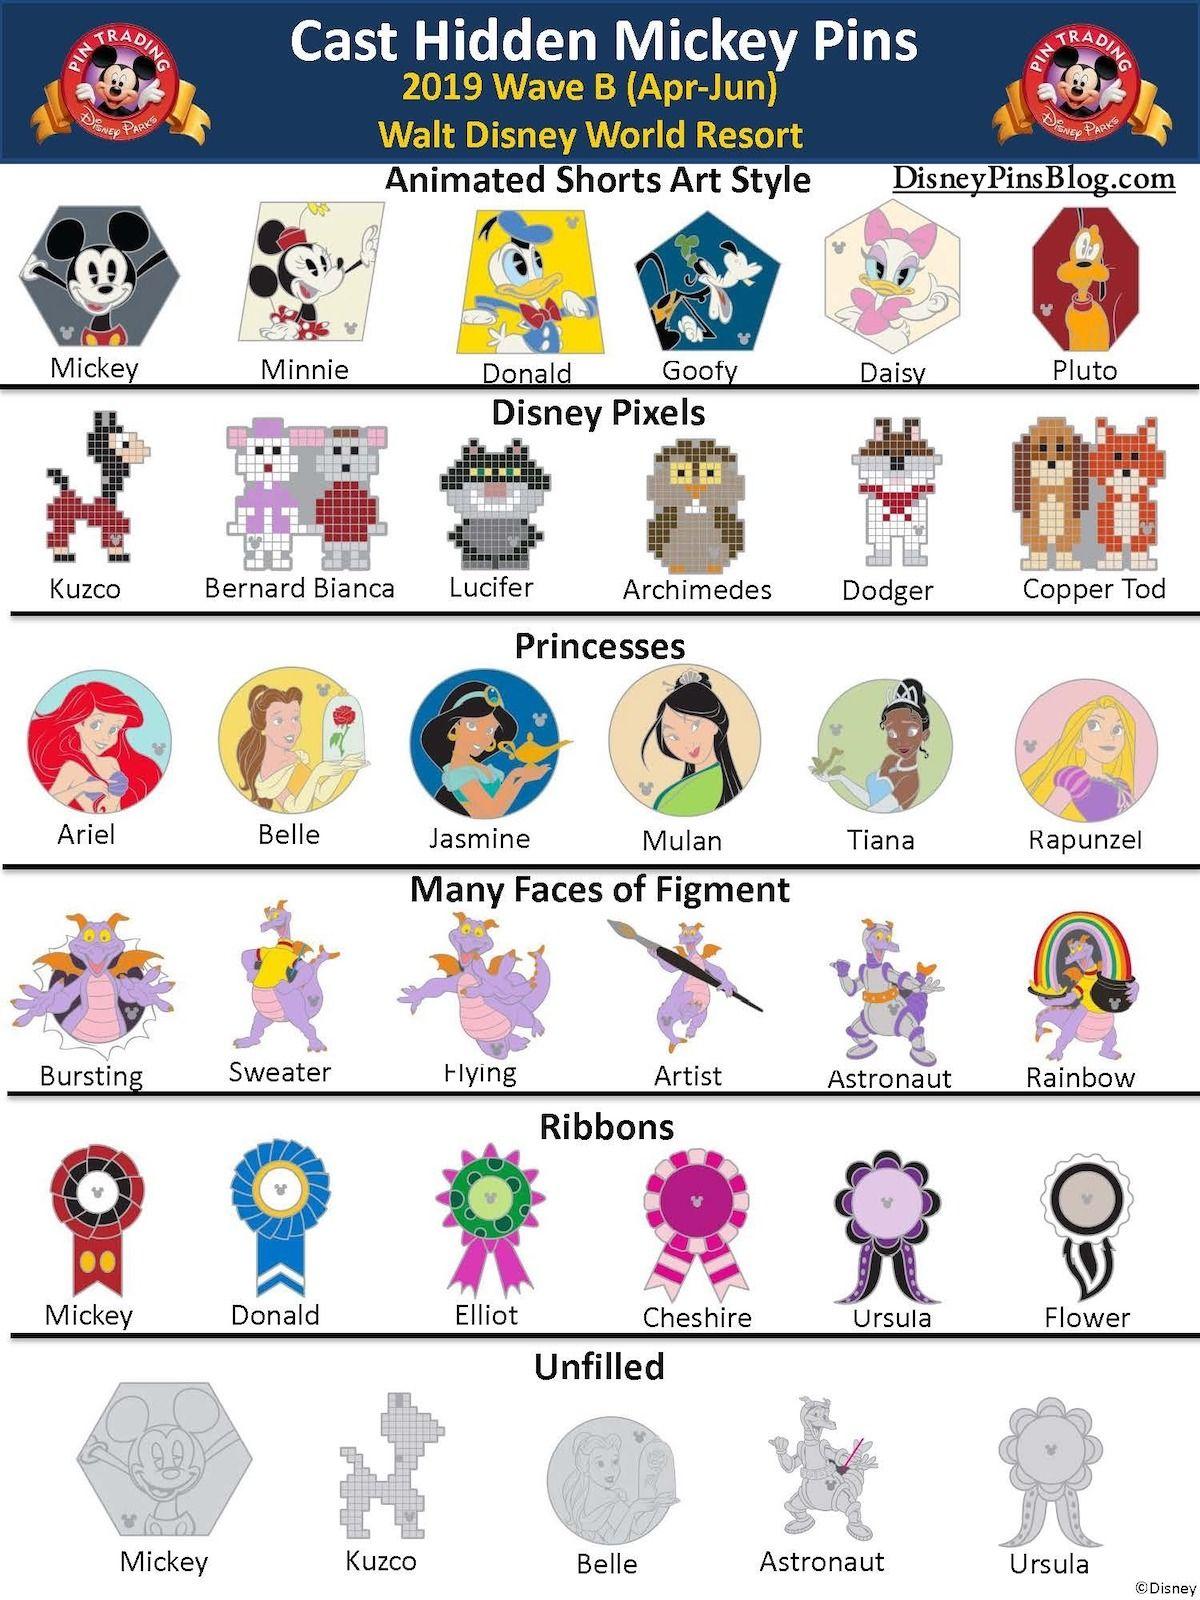 Disney pins 2019 Mystery Mickey